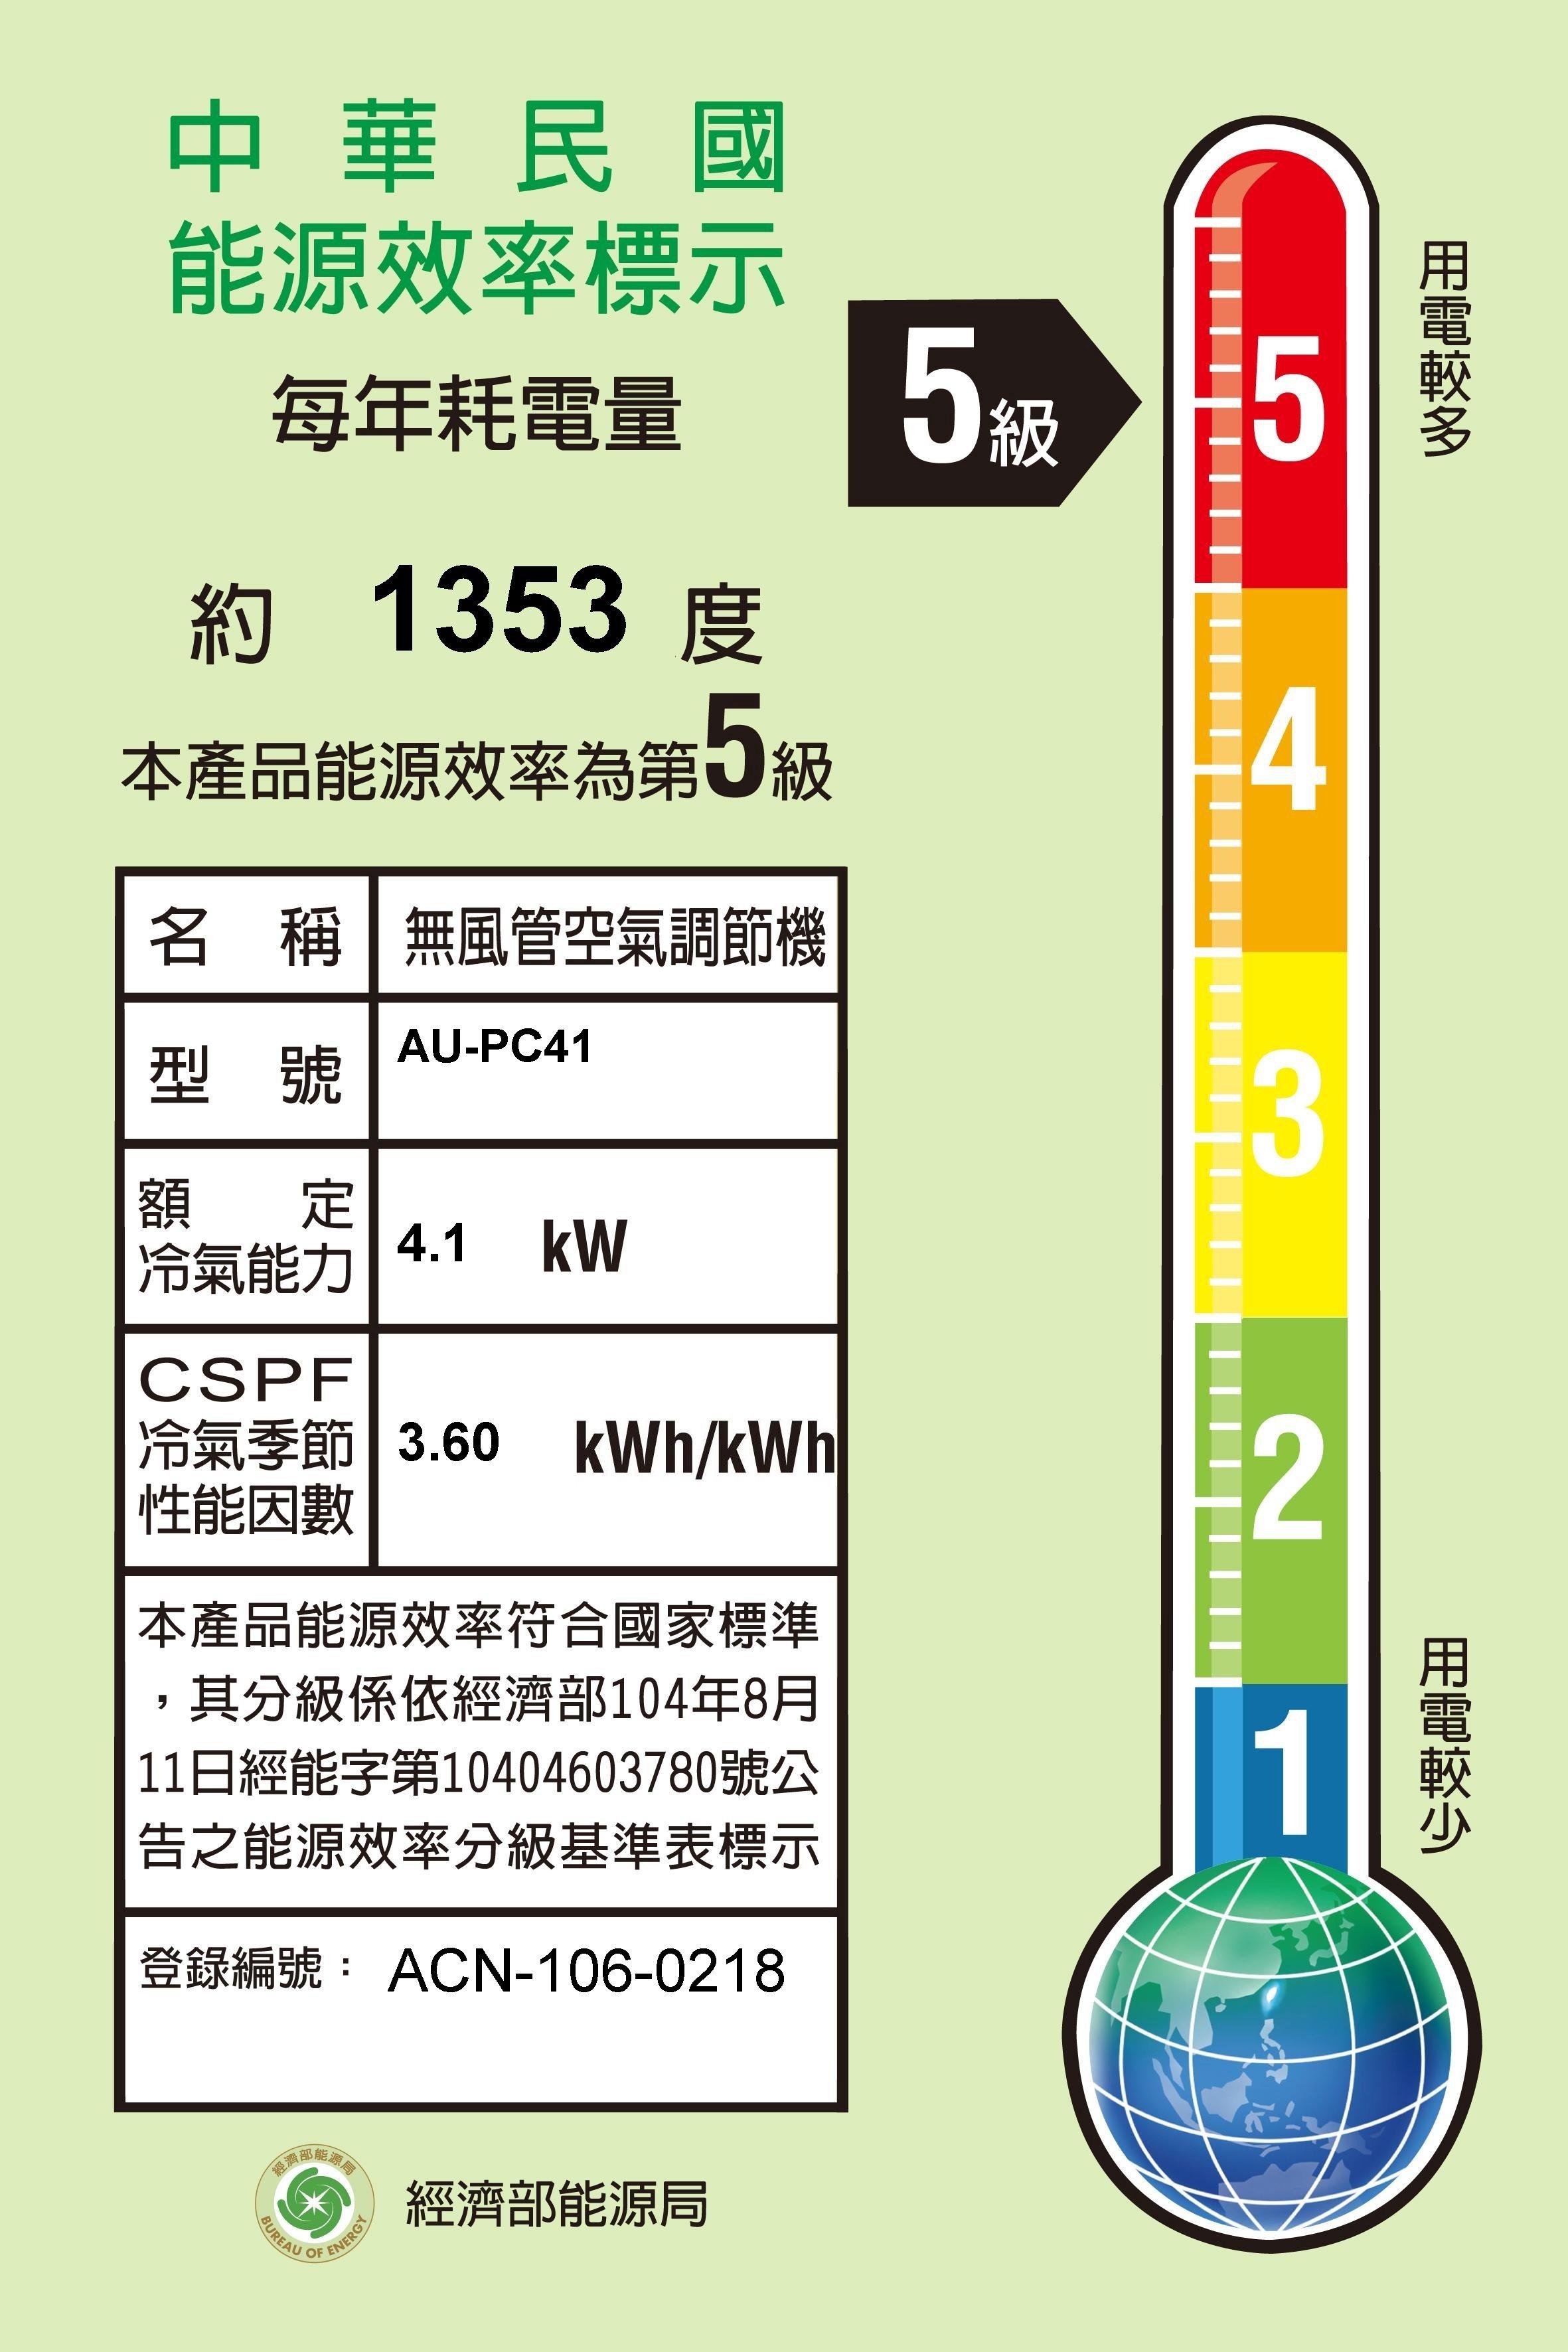 SAMPO聲寶 6-8坪 省電清淨 殺菌防鏽 雙倍淨 定頻分離式一對一冷氣 AU-PC41/AM-PC41 原廠保固